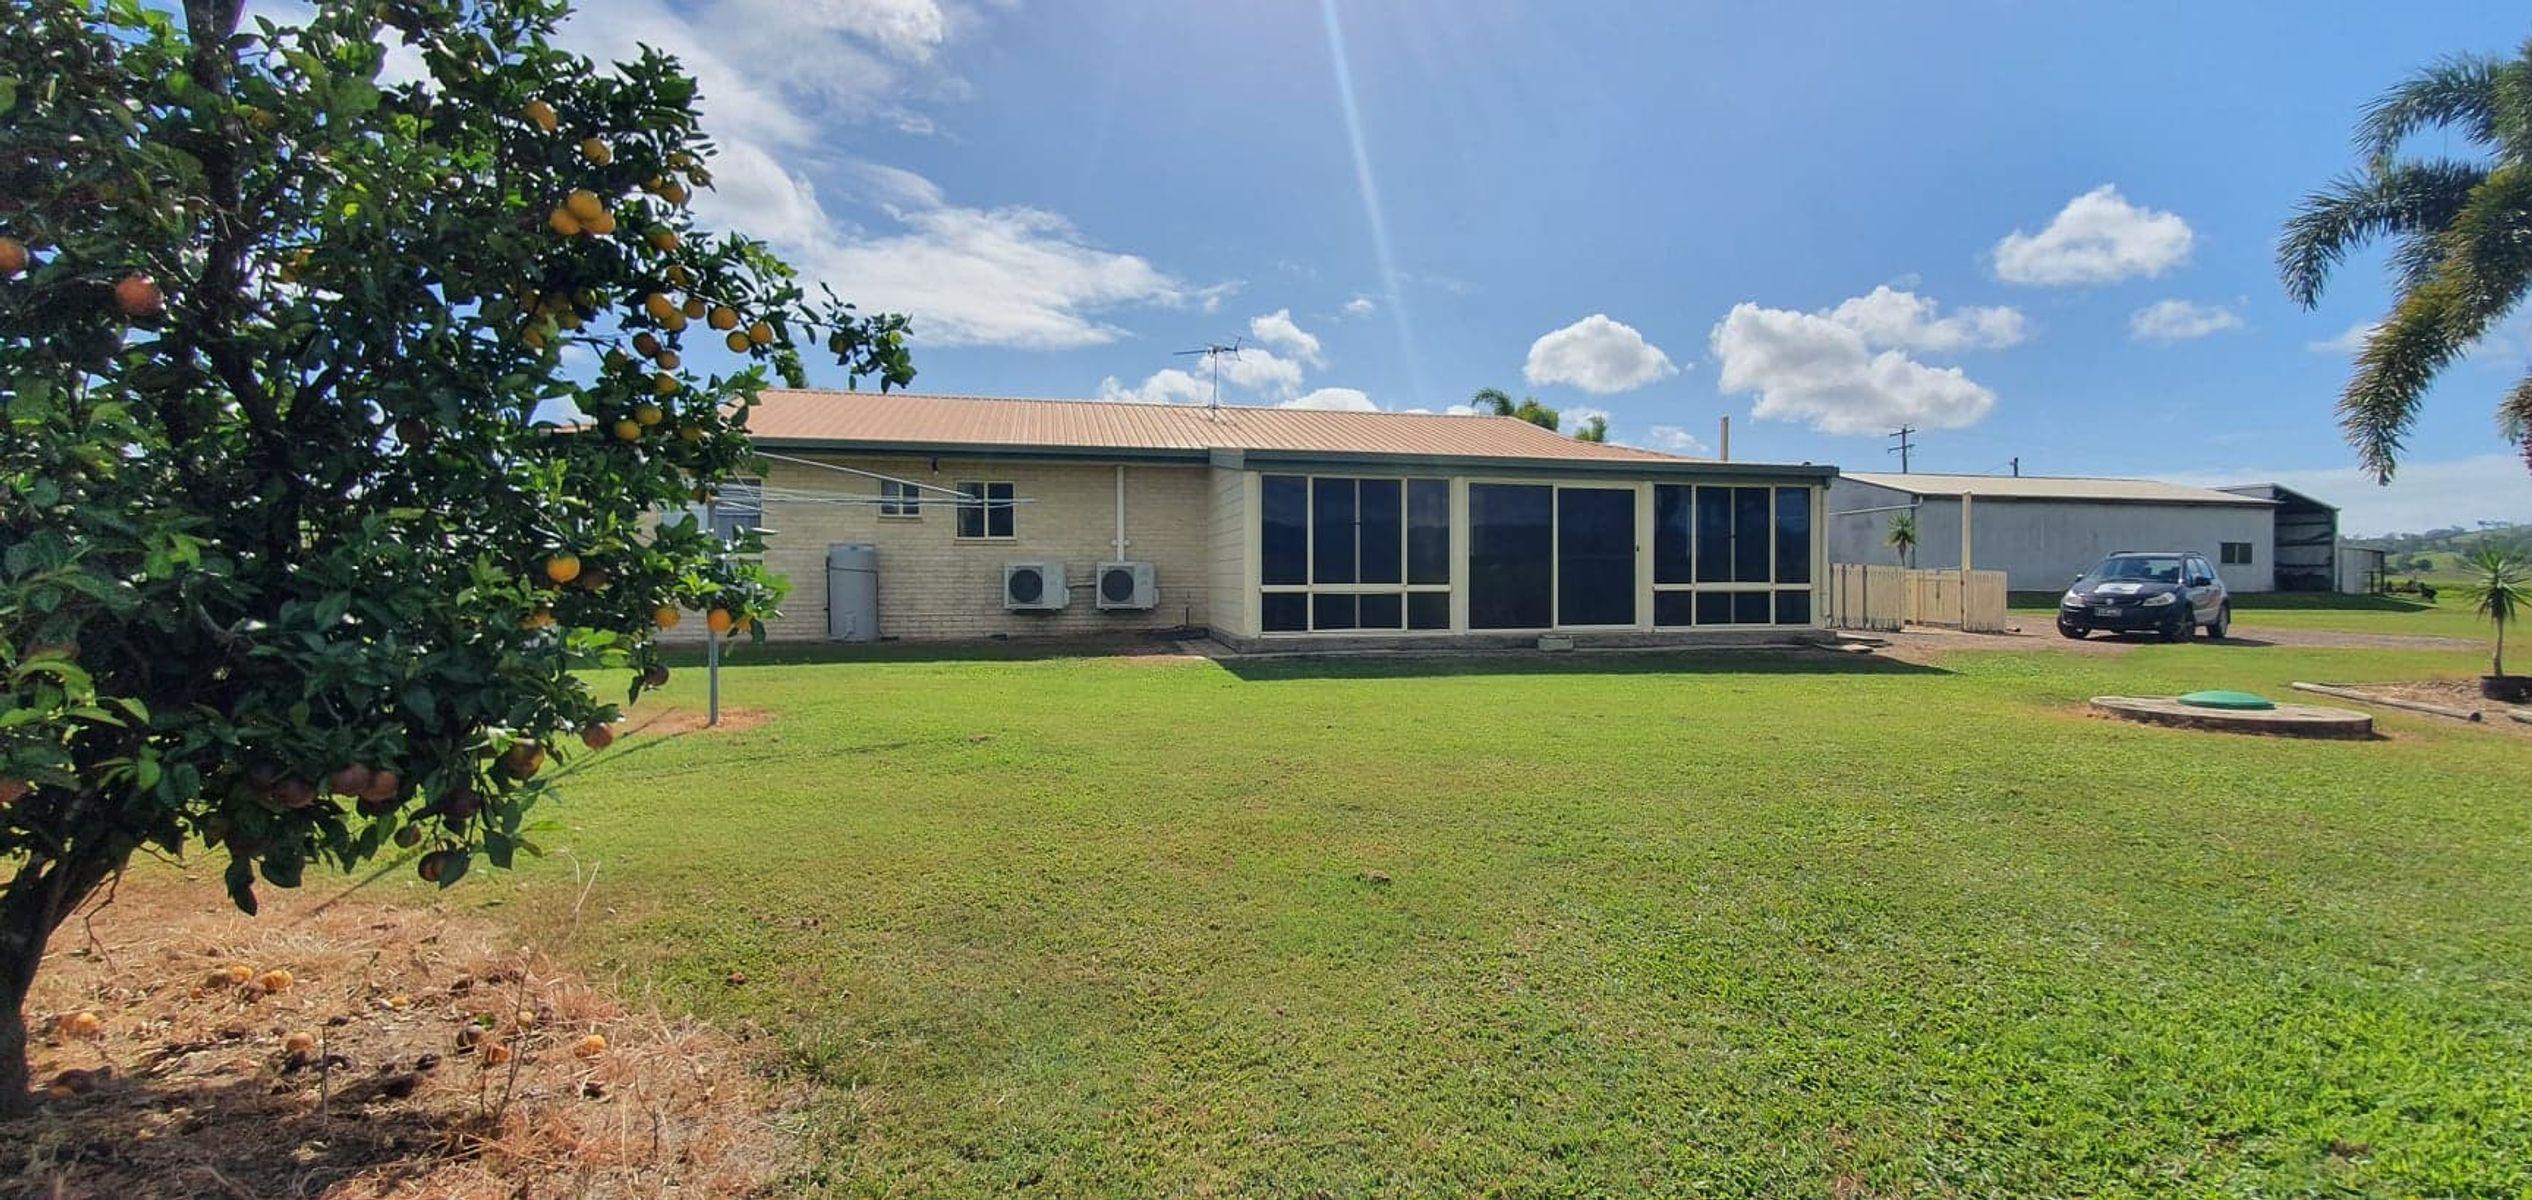 57 Whittaker's Road, Sarina, QLD 4737